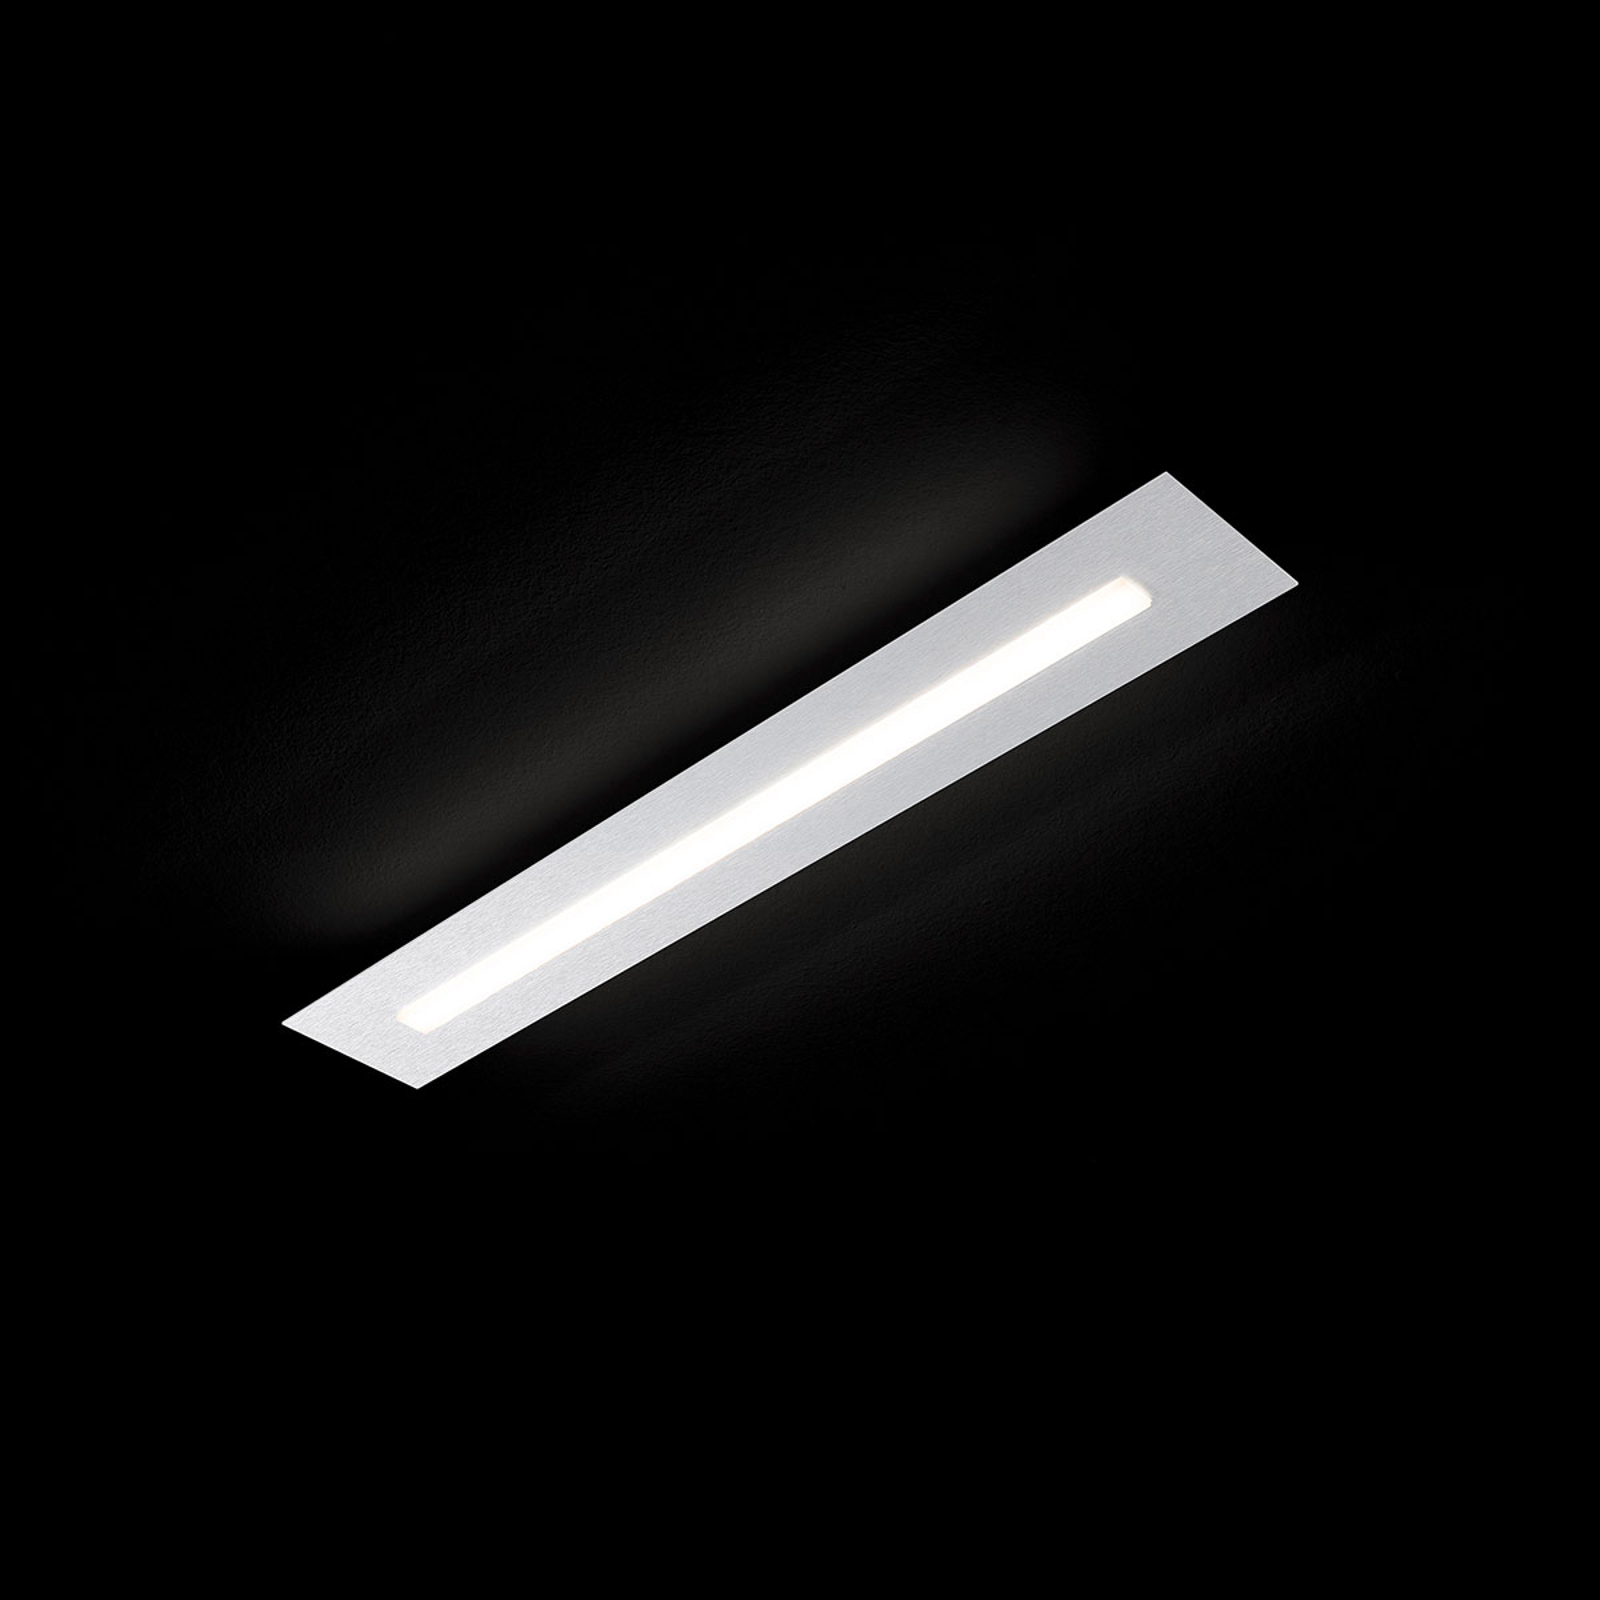 GROSSMANN Fis LED-Deckenleuchte, 57 cm